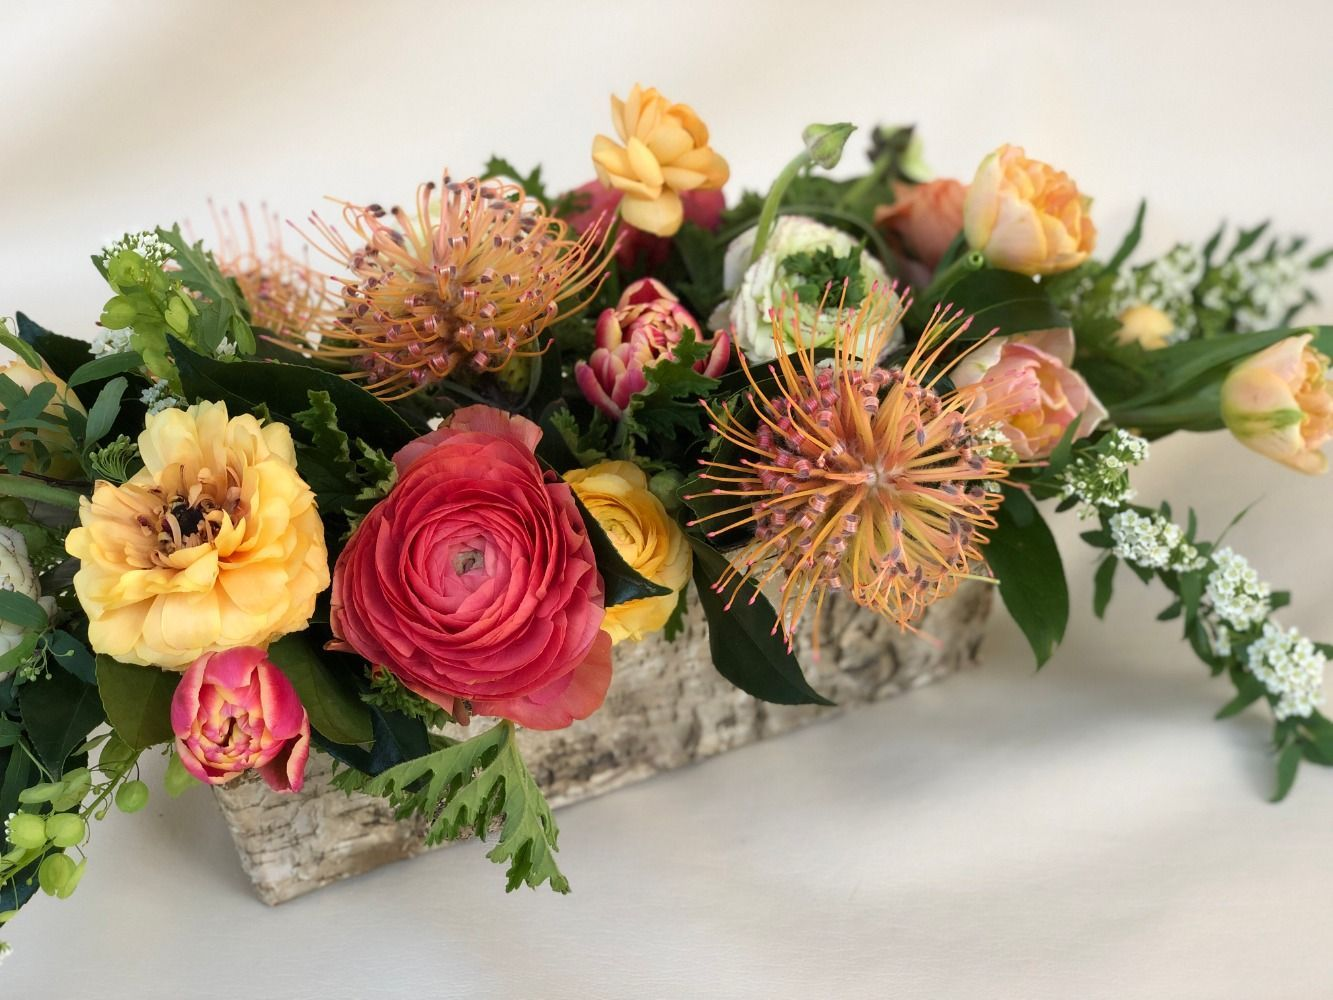 Del Mar Florist Societe Fine Flowers Local Flower Delivery Del